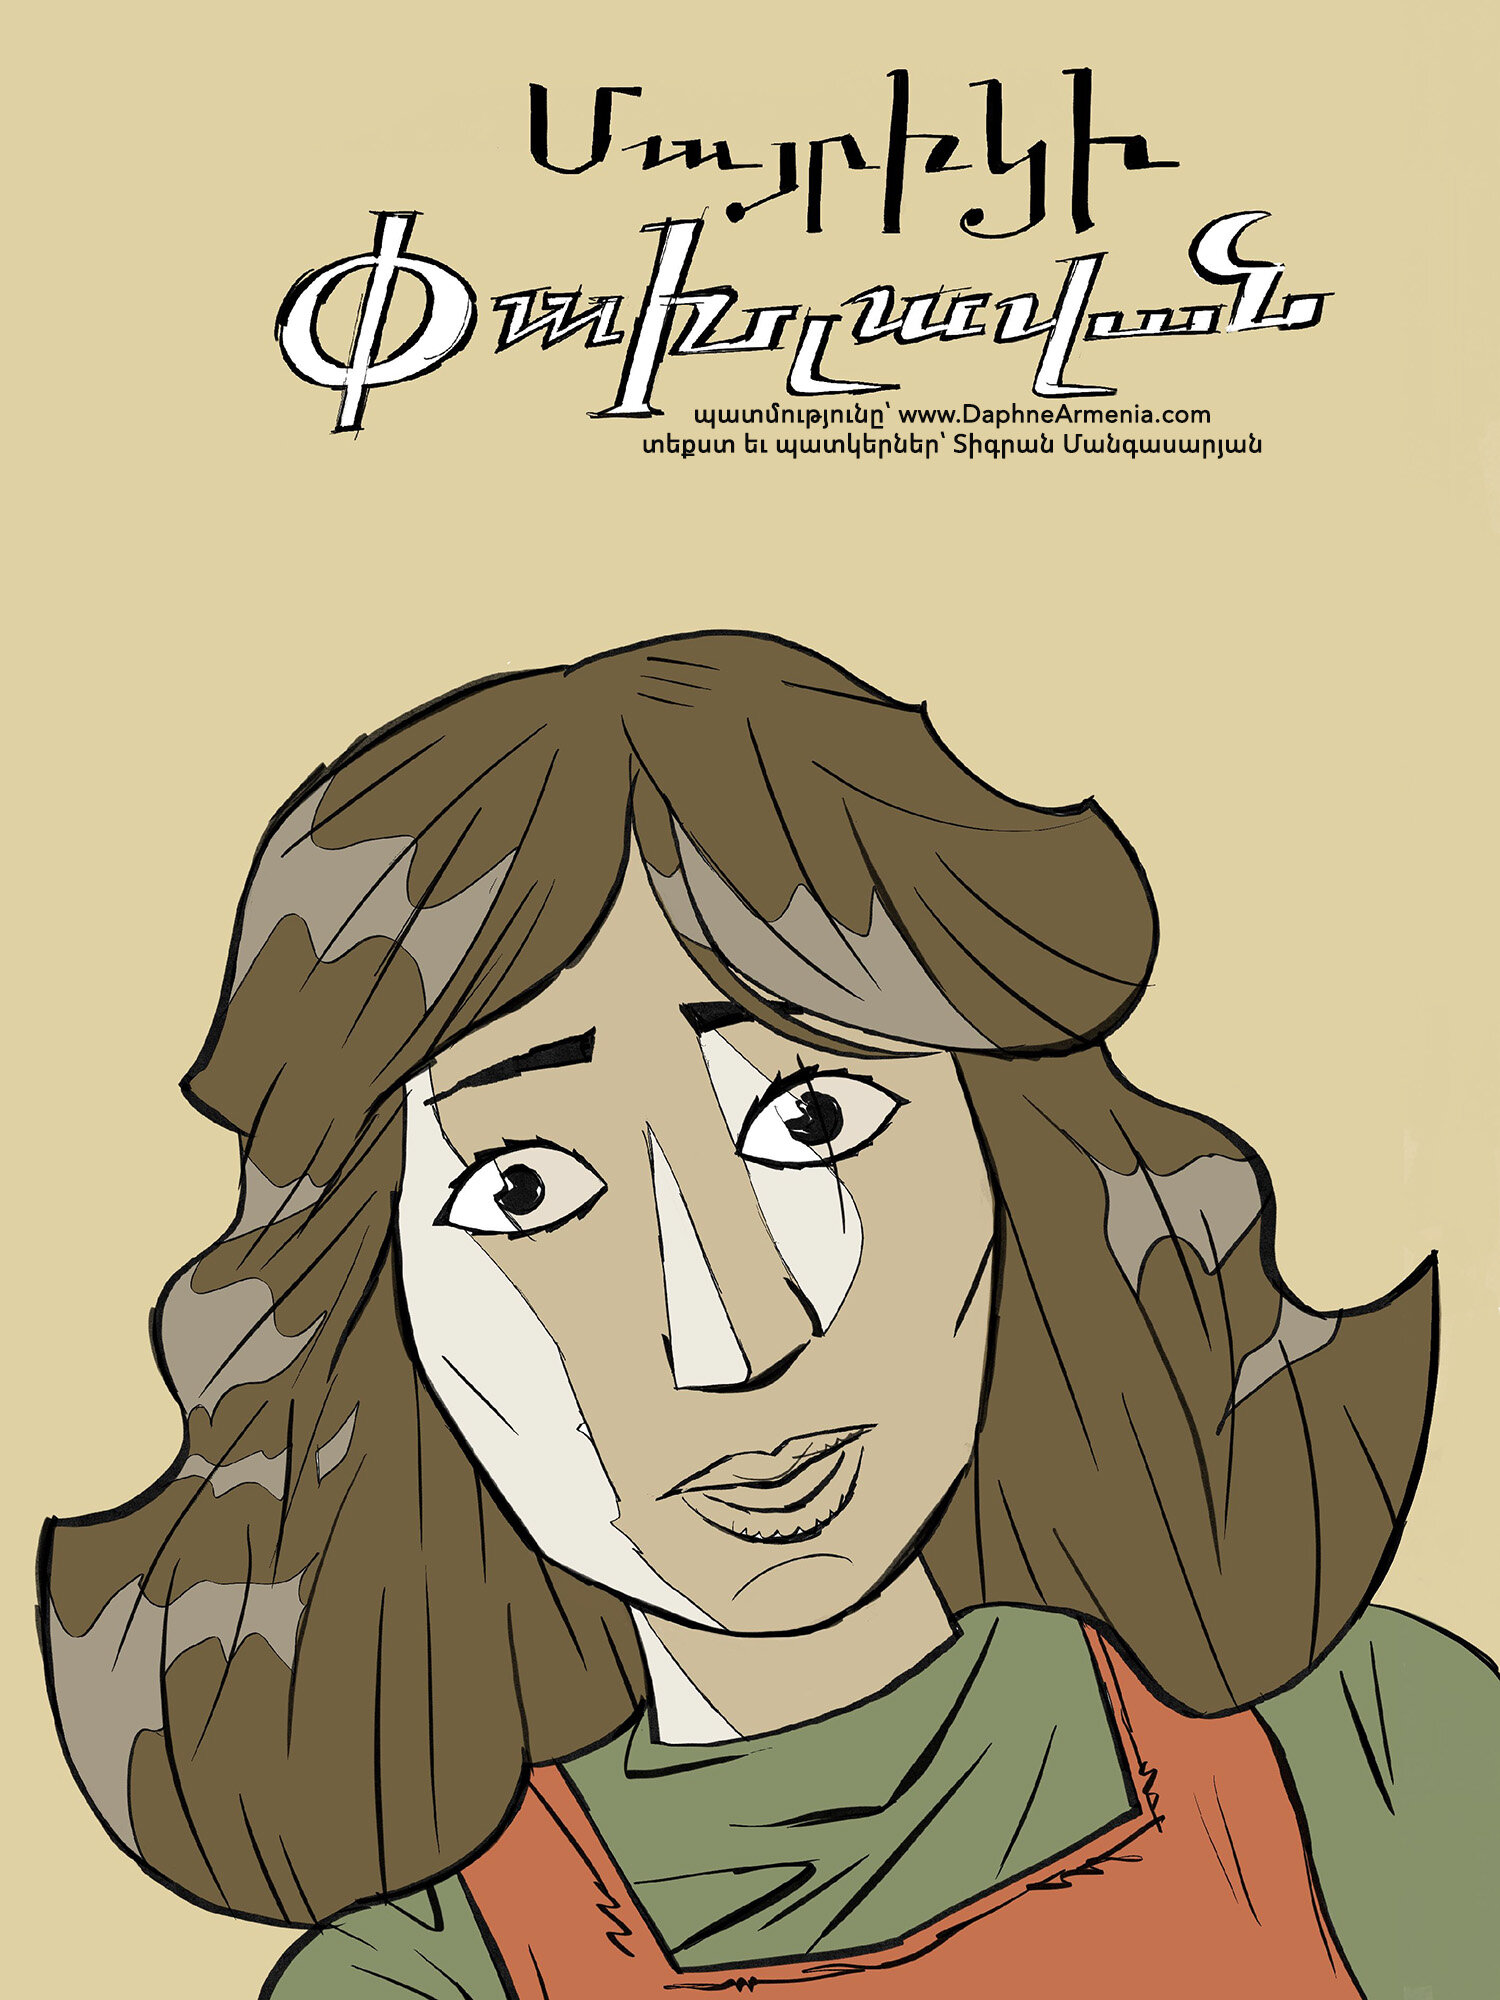 paxlava-comics-1.jpg